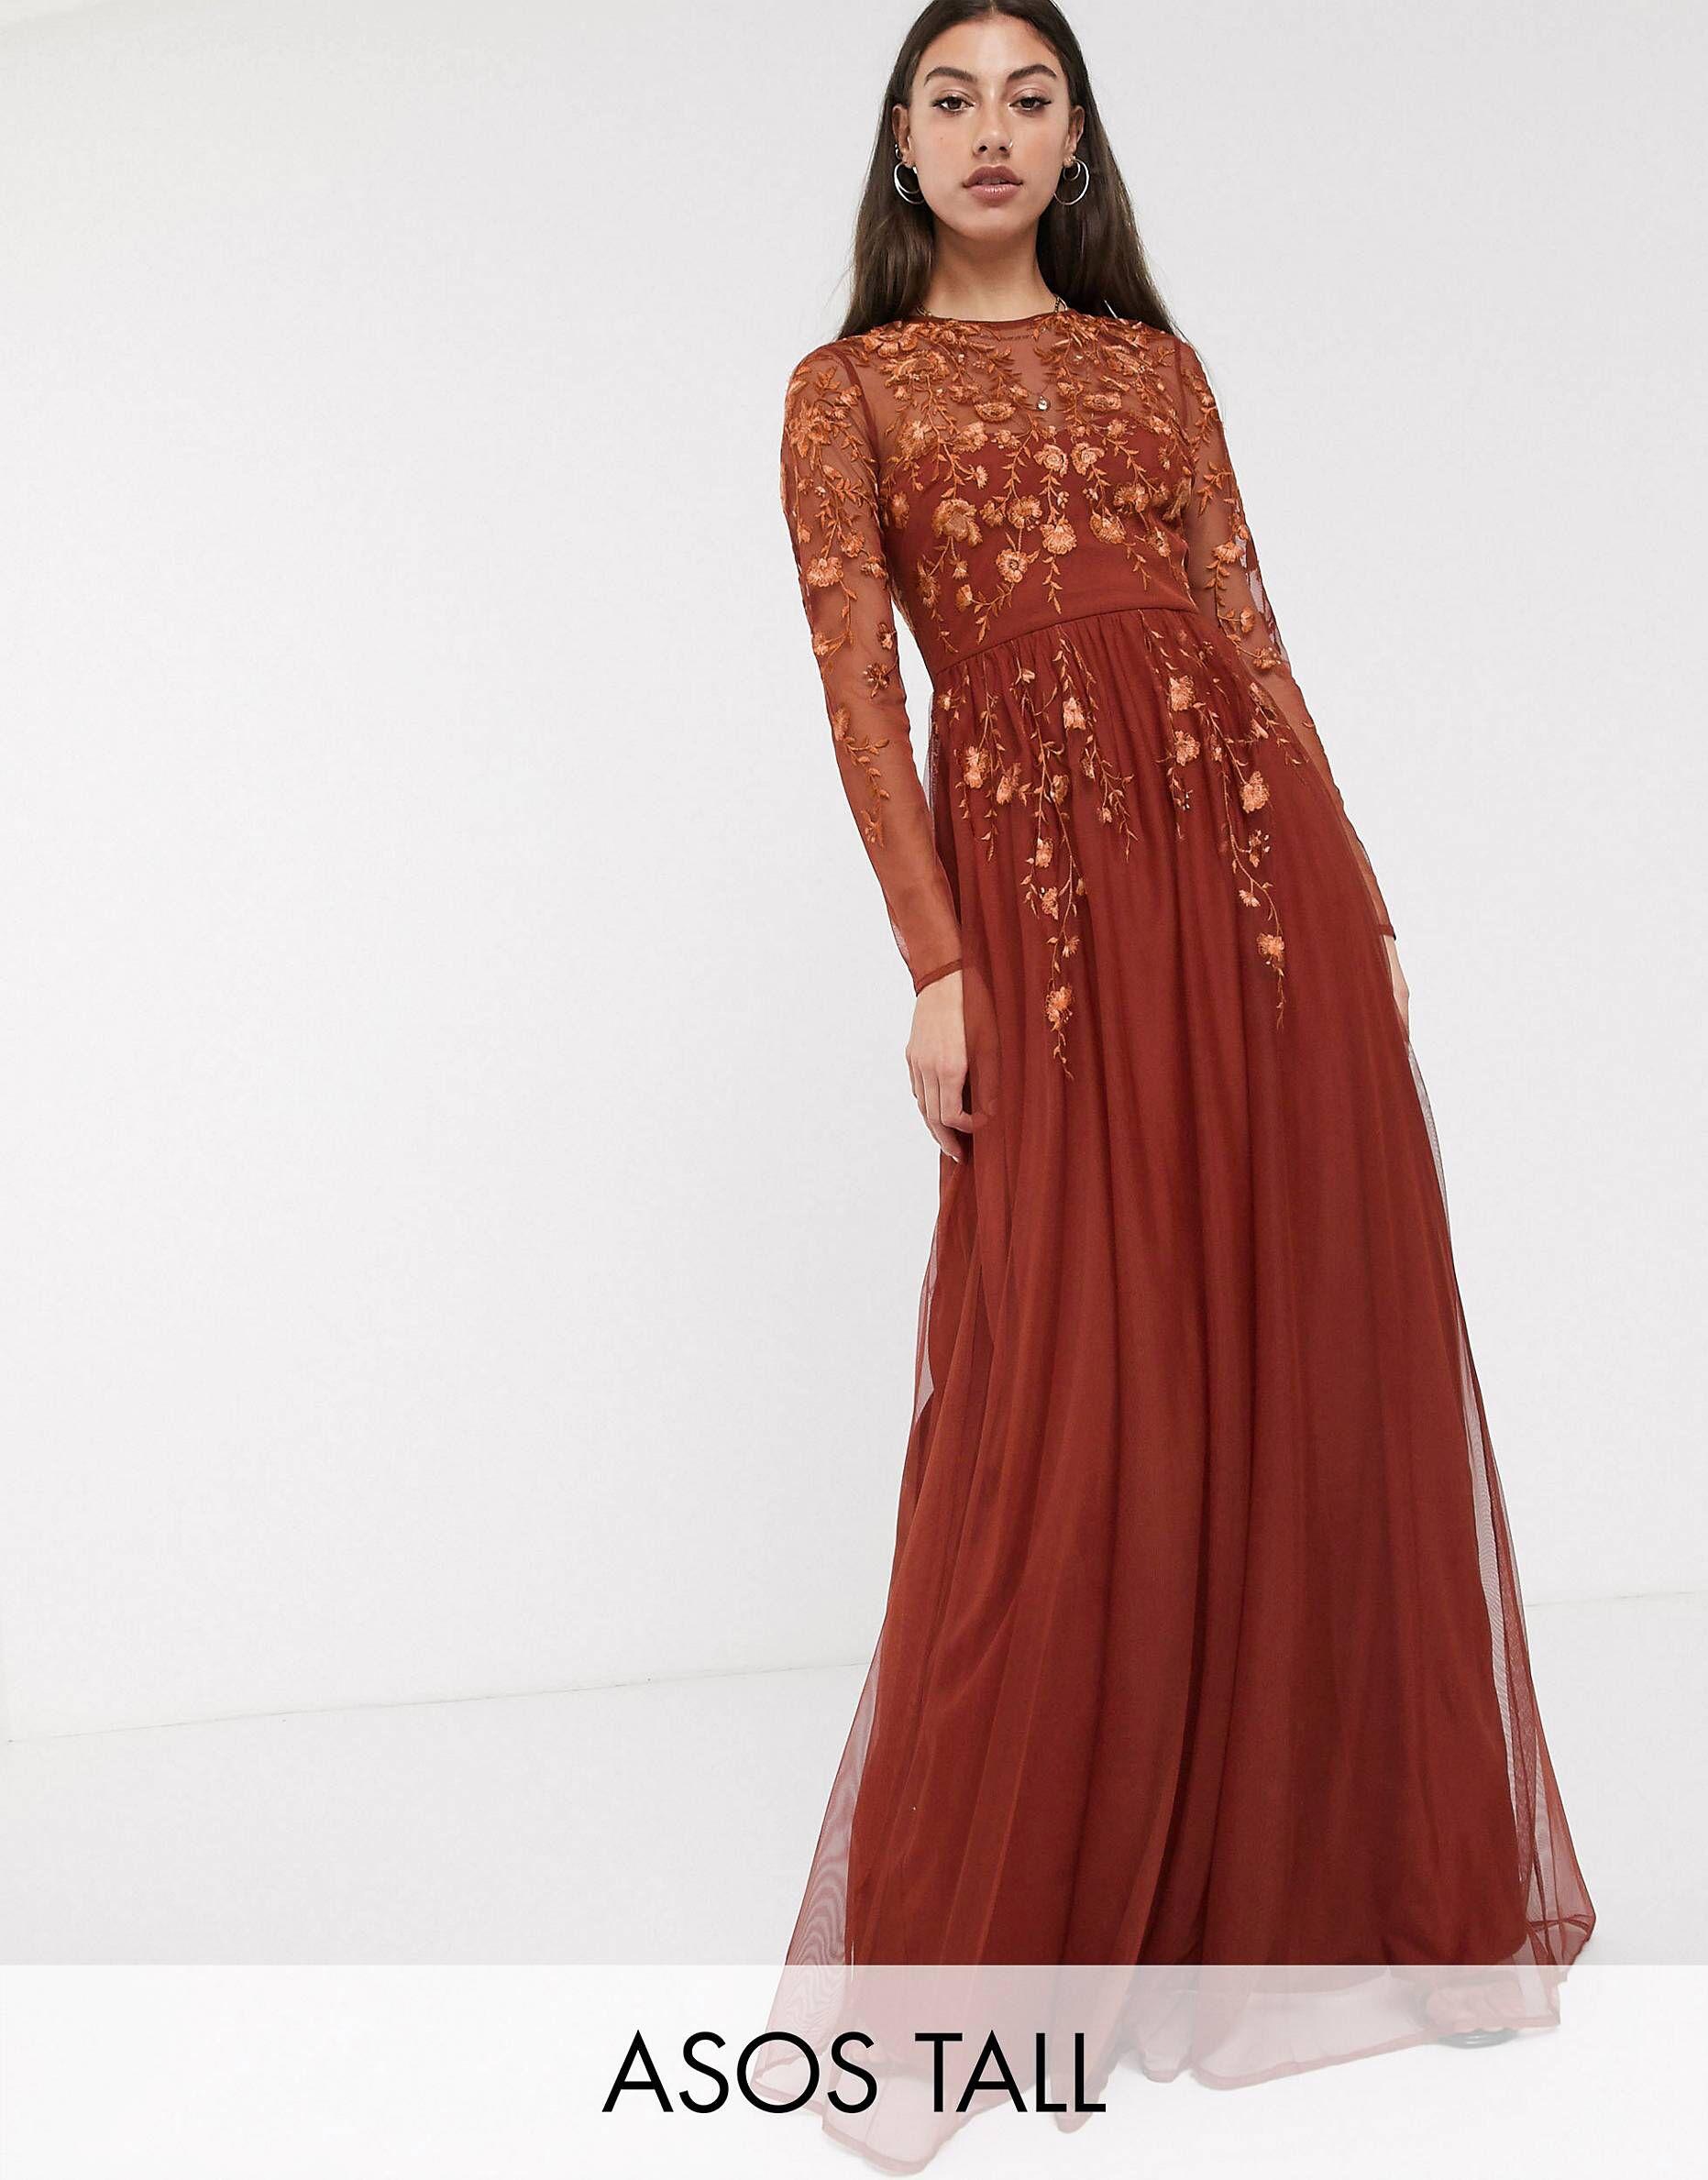 Pin By Tori Whitehead On Wedding Ideas Long Sleeve Bridesmaid Dress Long Sleeve Maxi Dress Orange Long Sleeve Dress [ 2378 x 1863 Pixel ]